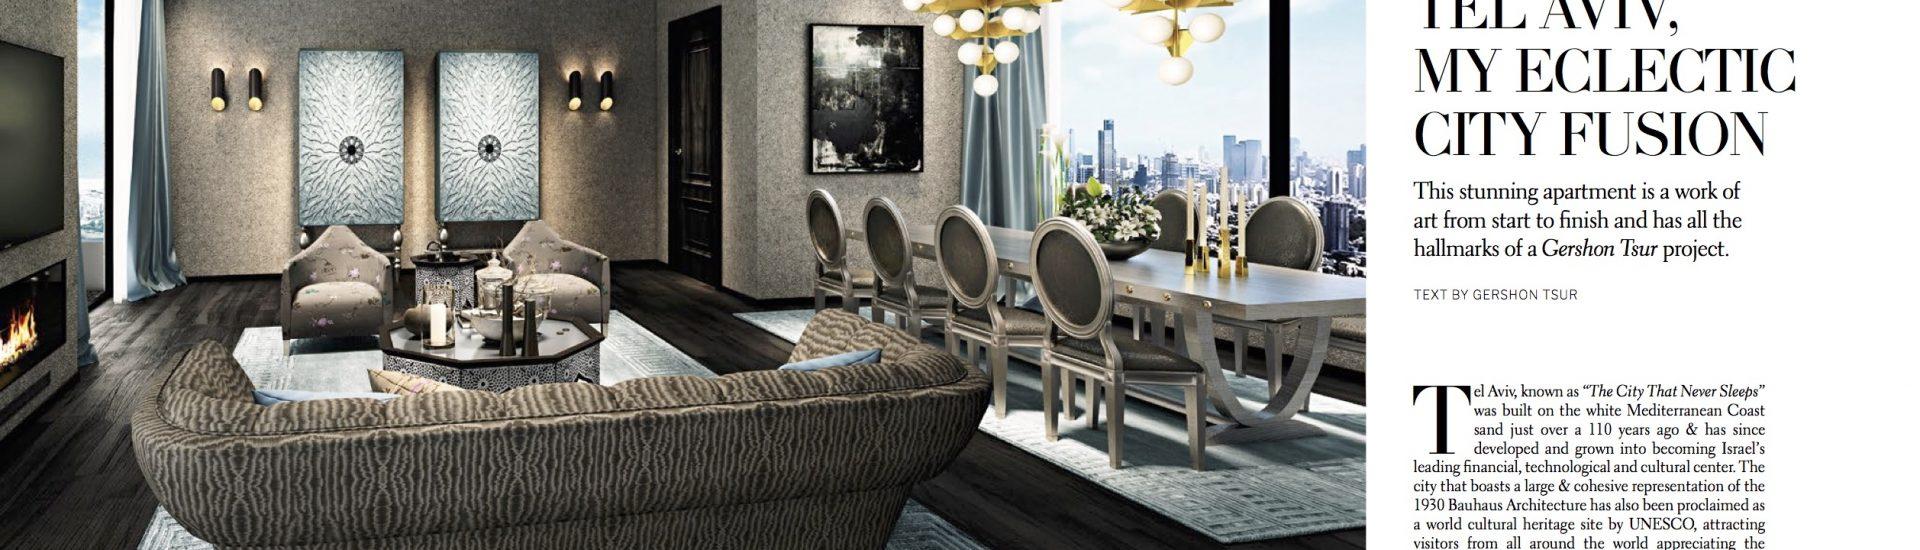 CITY_LIVING_Magazine - Gershon Tsur - Telaviv, my eclectic city fusion